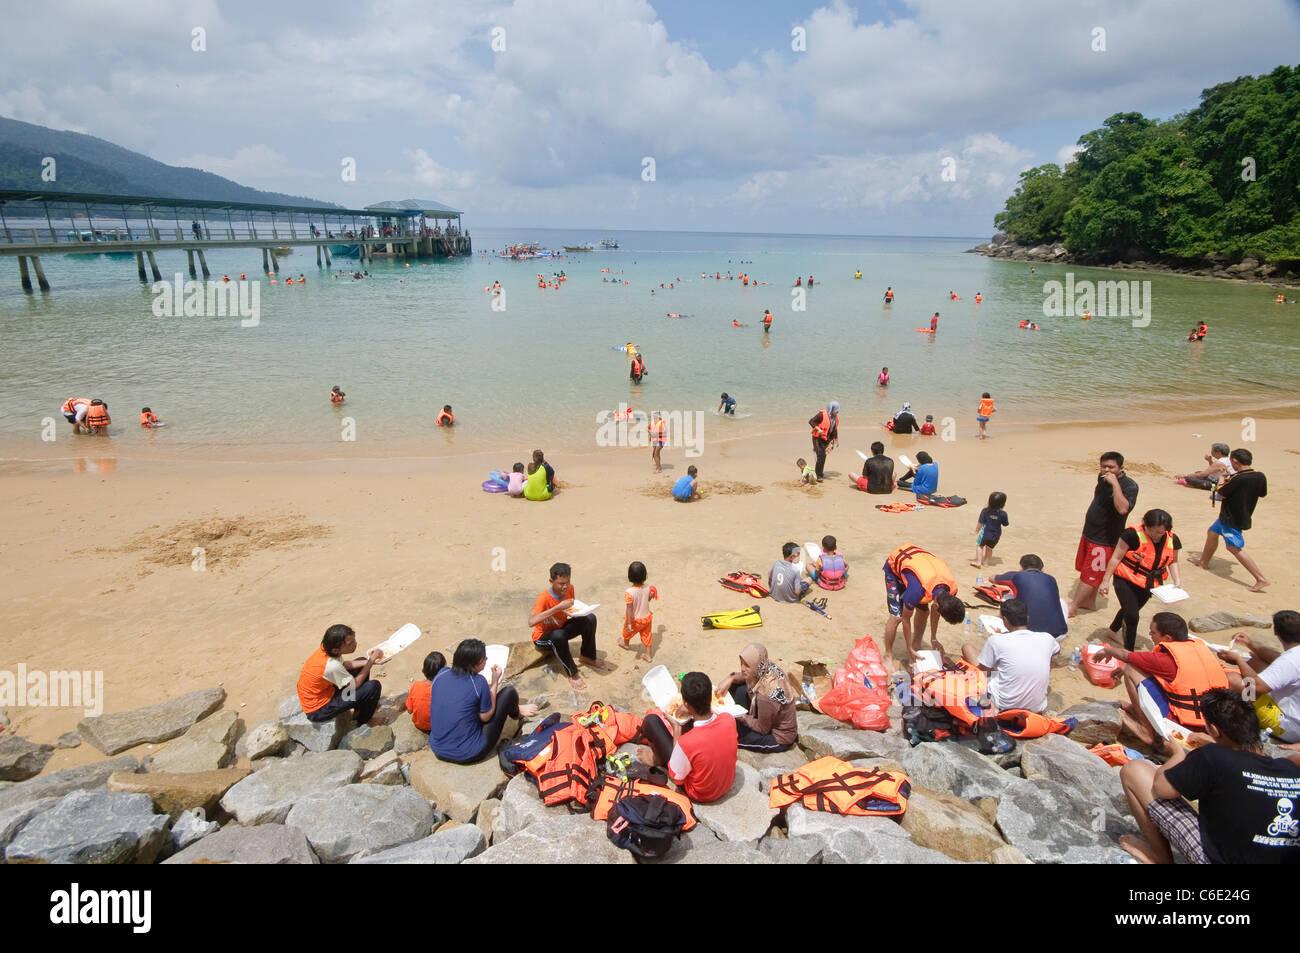 Tourists snorkeling on the beach of the Marine Park, Pulau Tioman Island, Malaysia, Southeast Asia, Asia - Stock Image